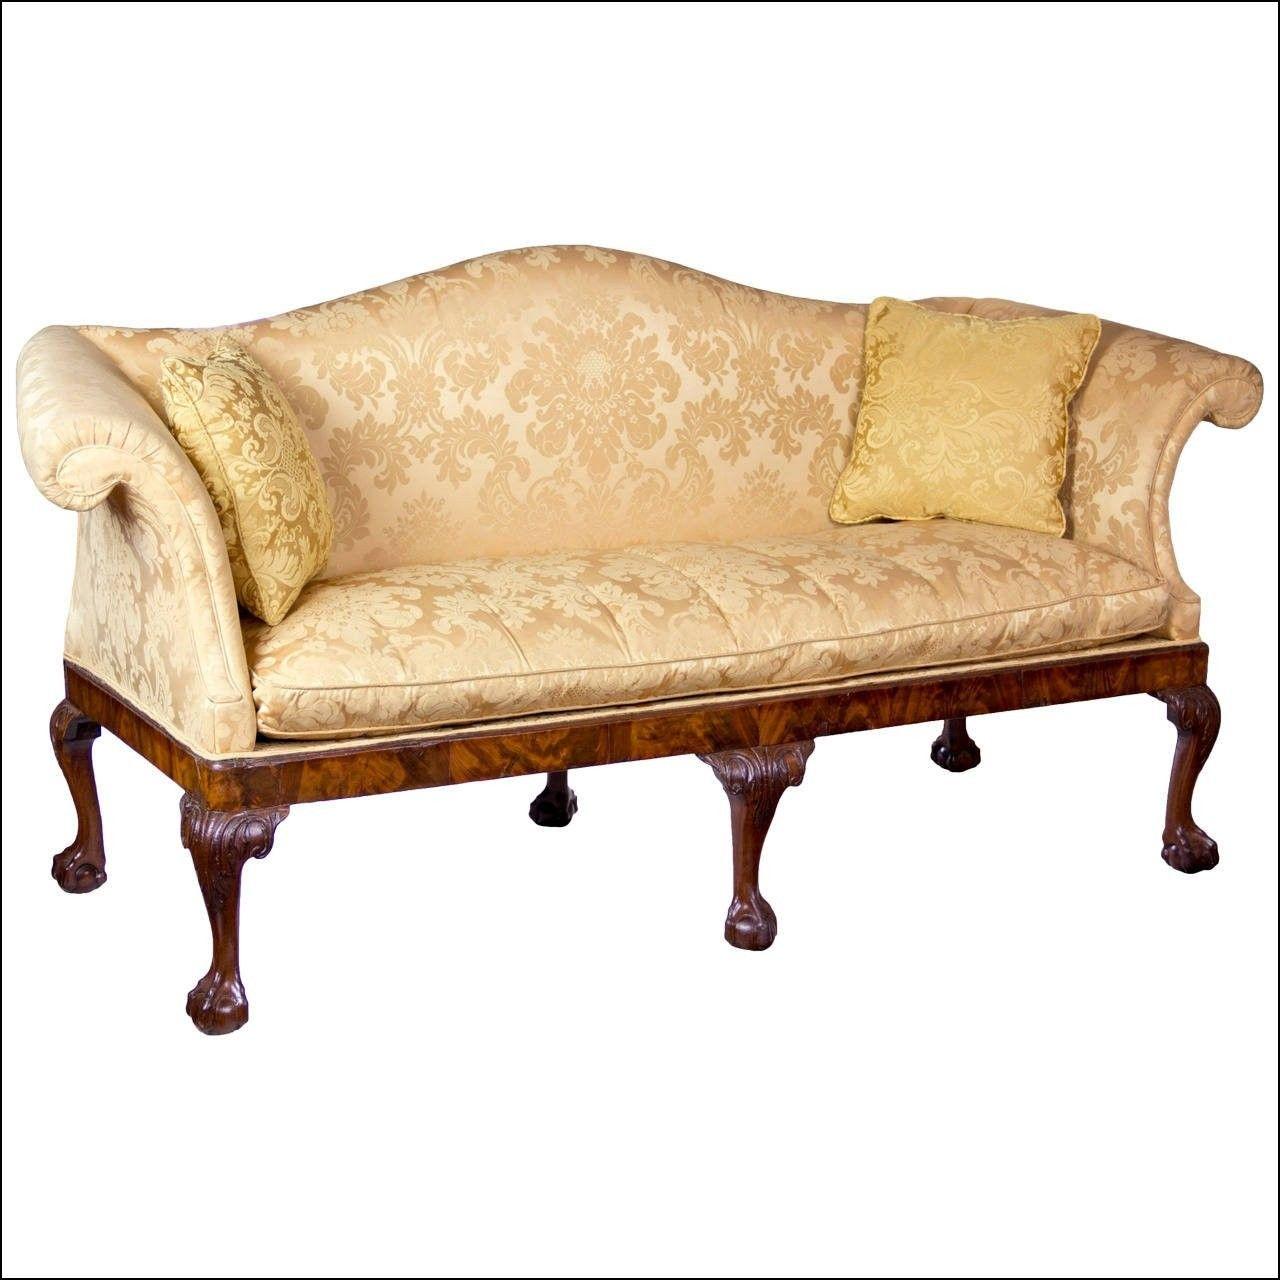 Camelback Sofas For Sale Camelback Sale Pinterest75